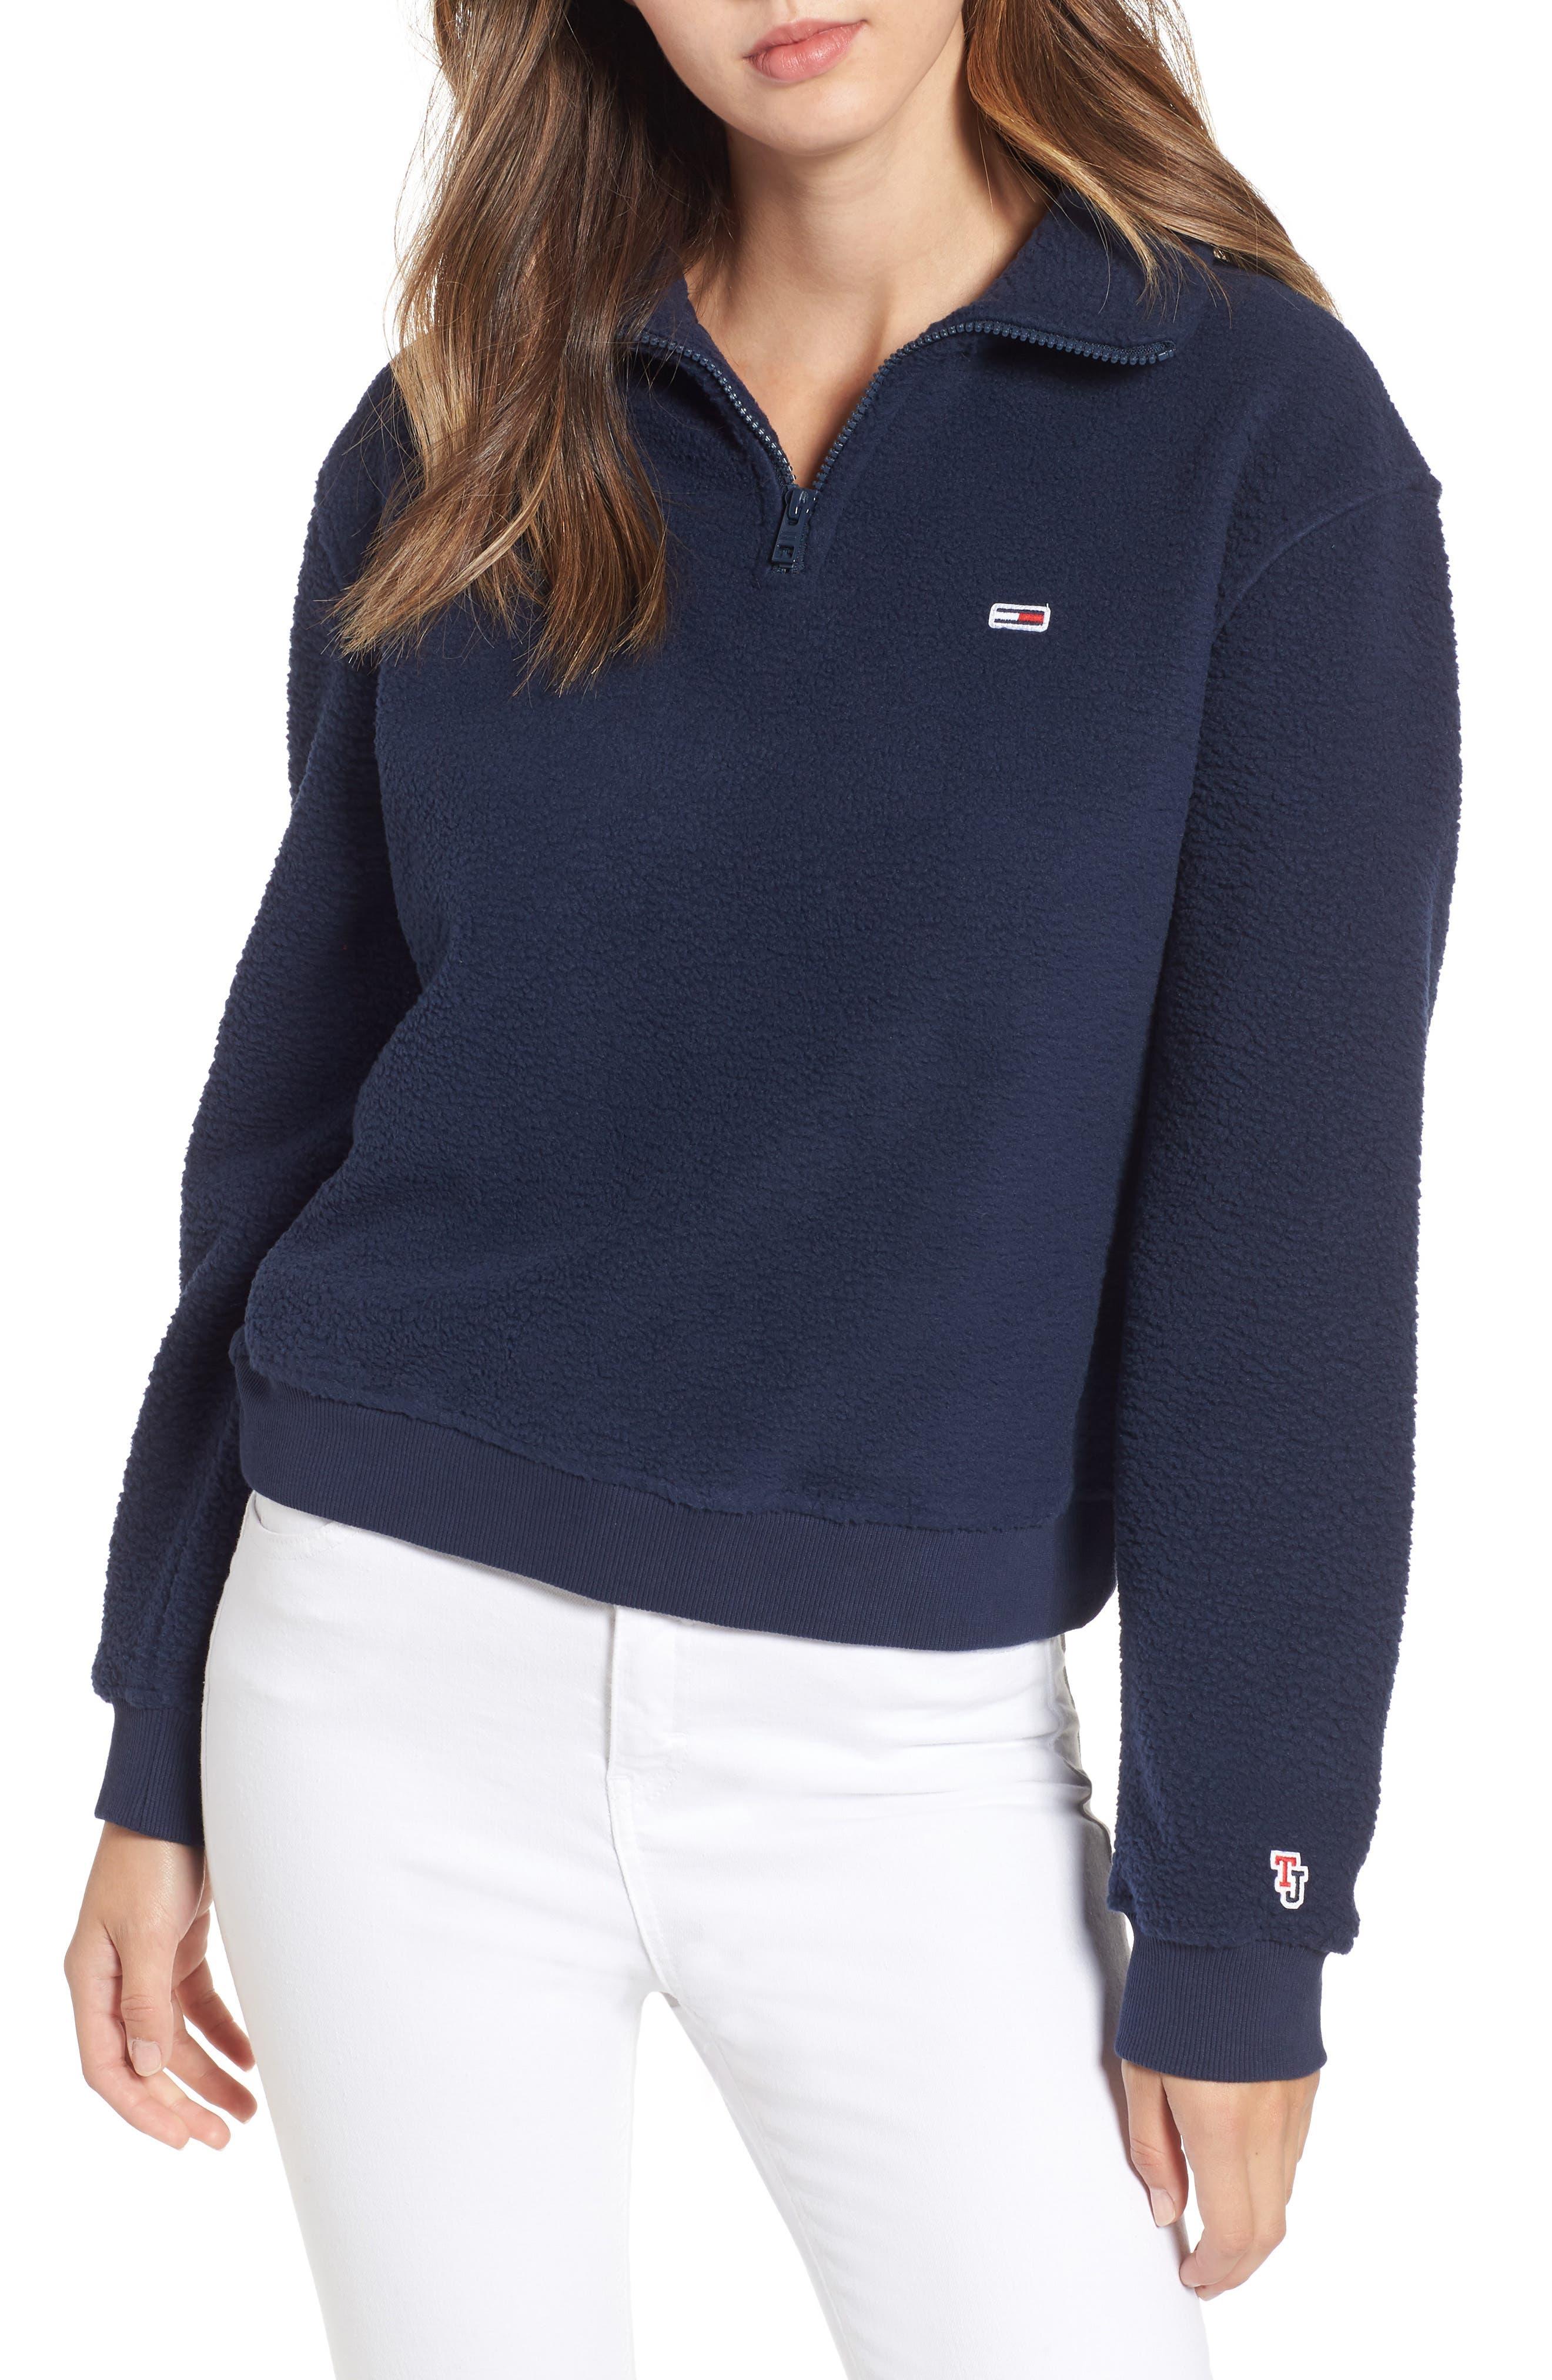 TJW Classics Polar Fleece Sweatshirt,                             Main thumbnail 1, color,                             002